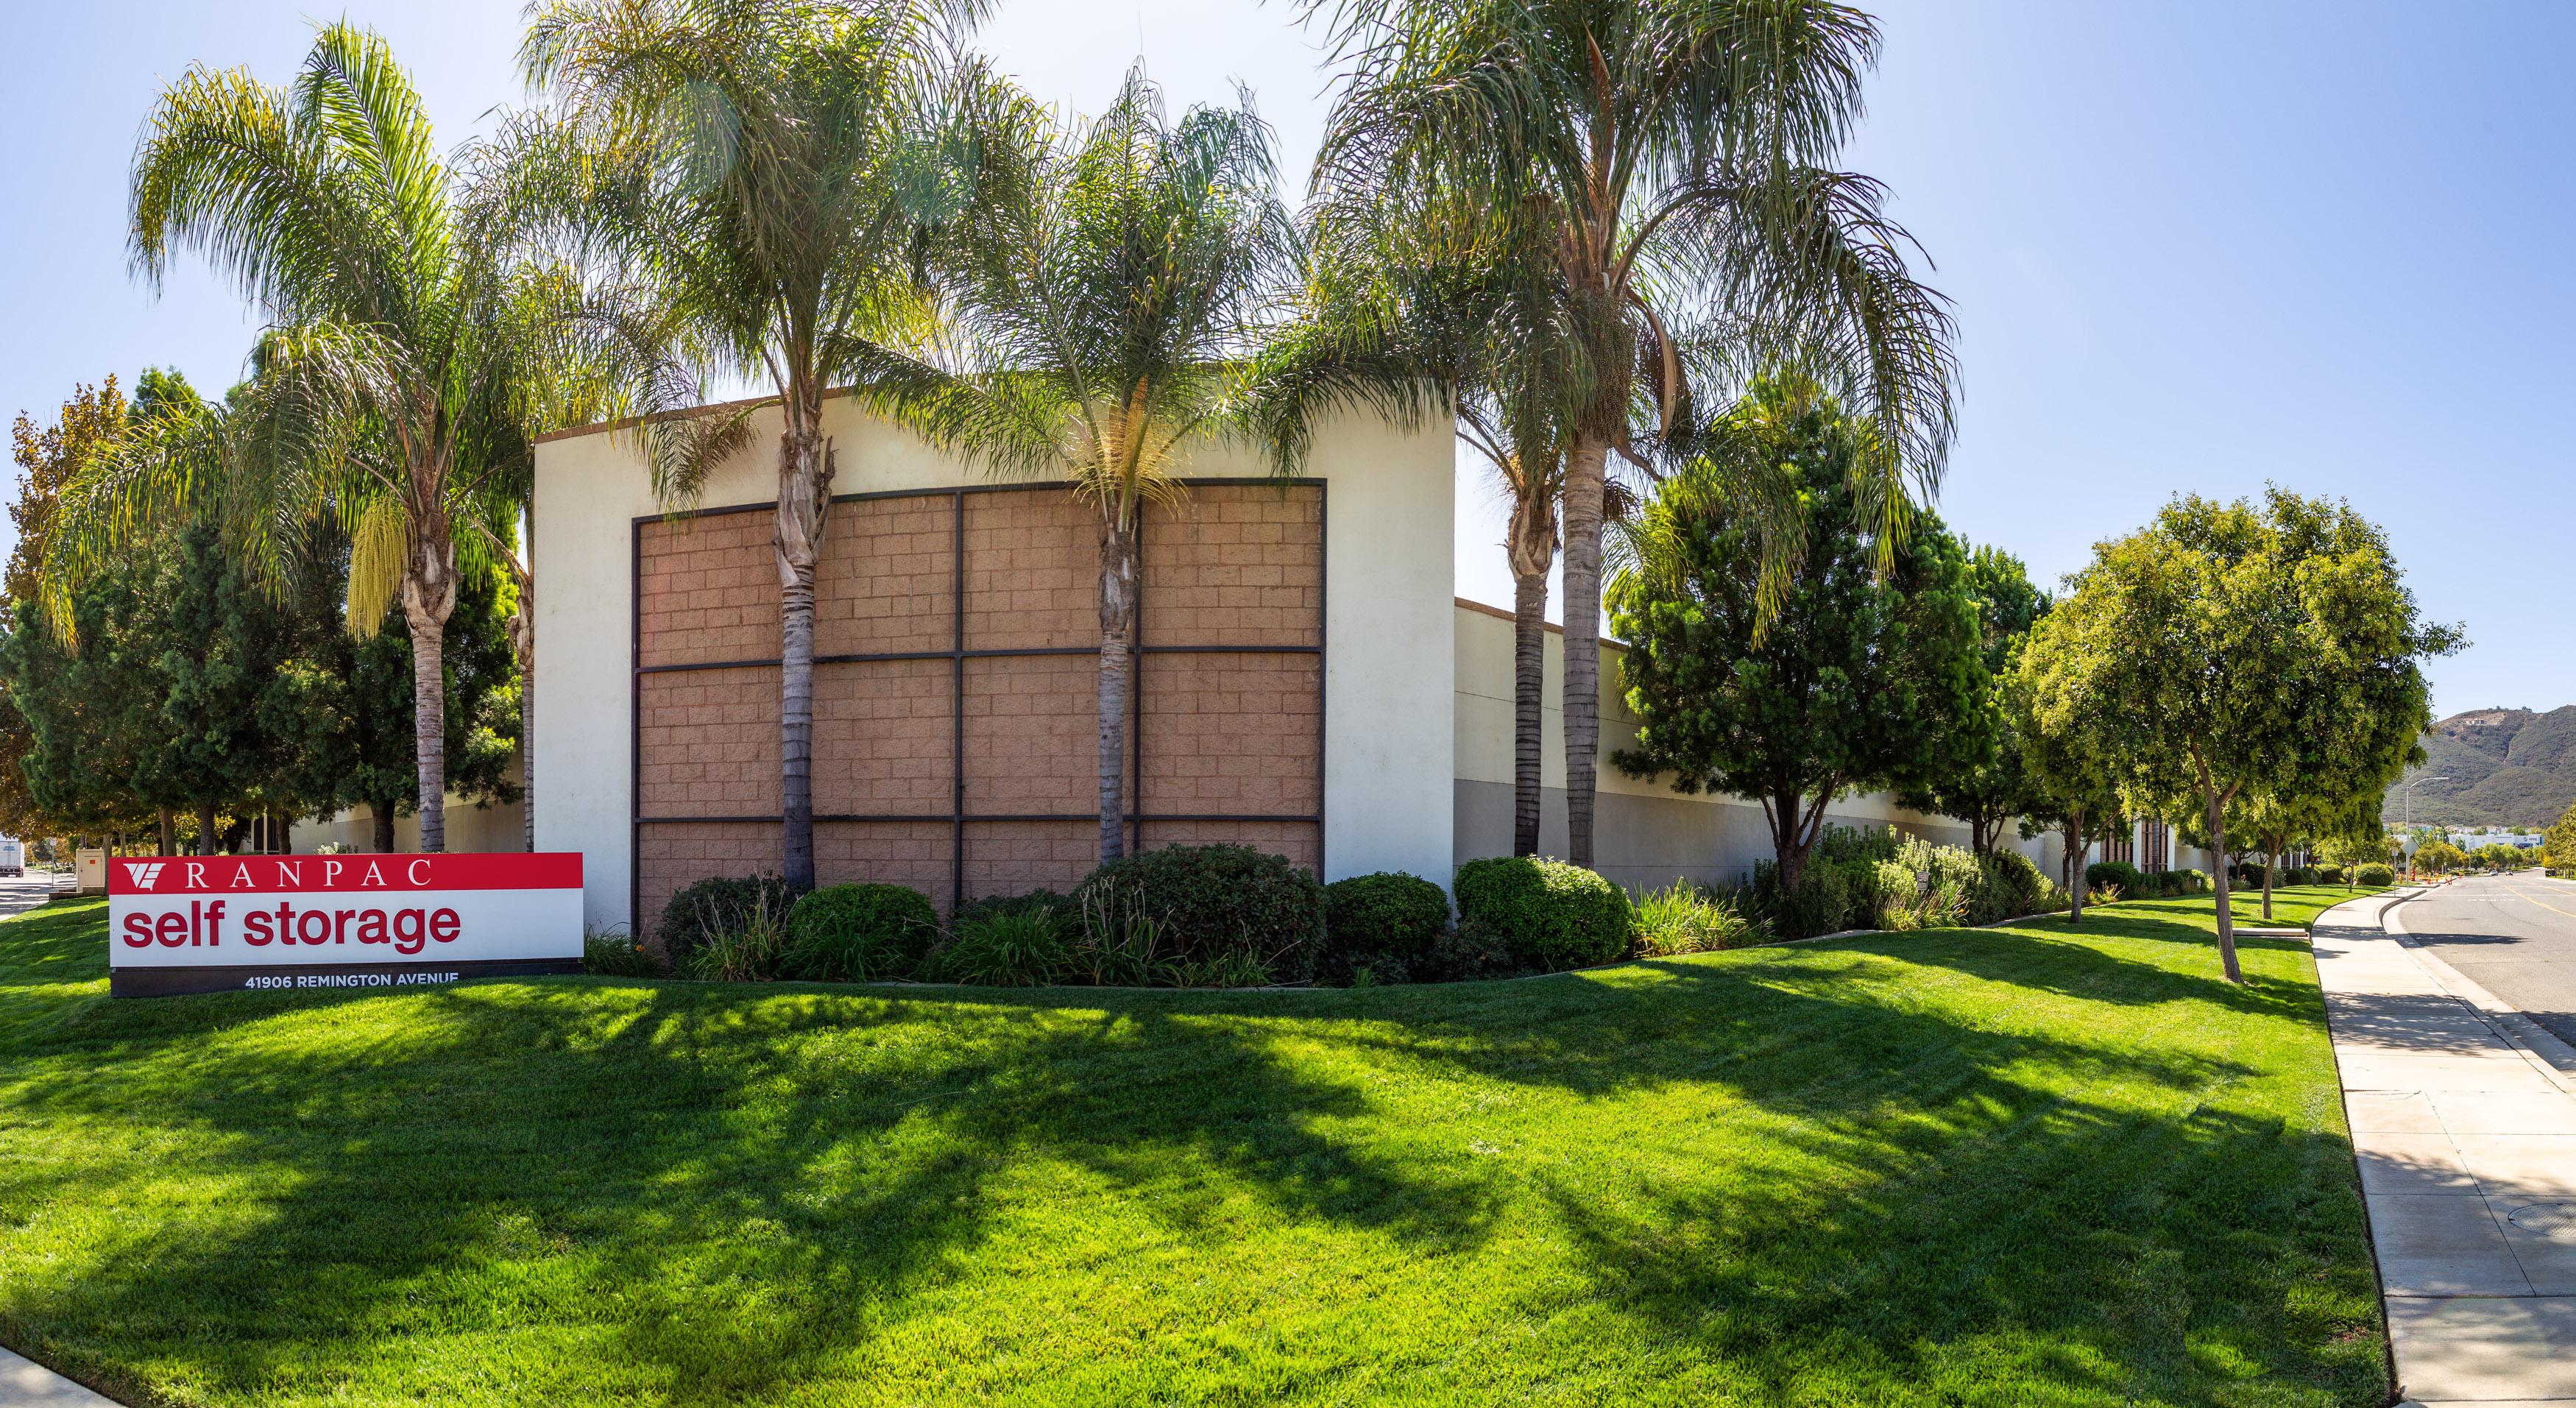 Ranpac Self Storage Remington Ave. Temecula CA